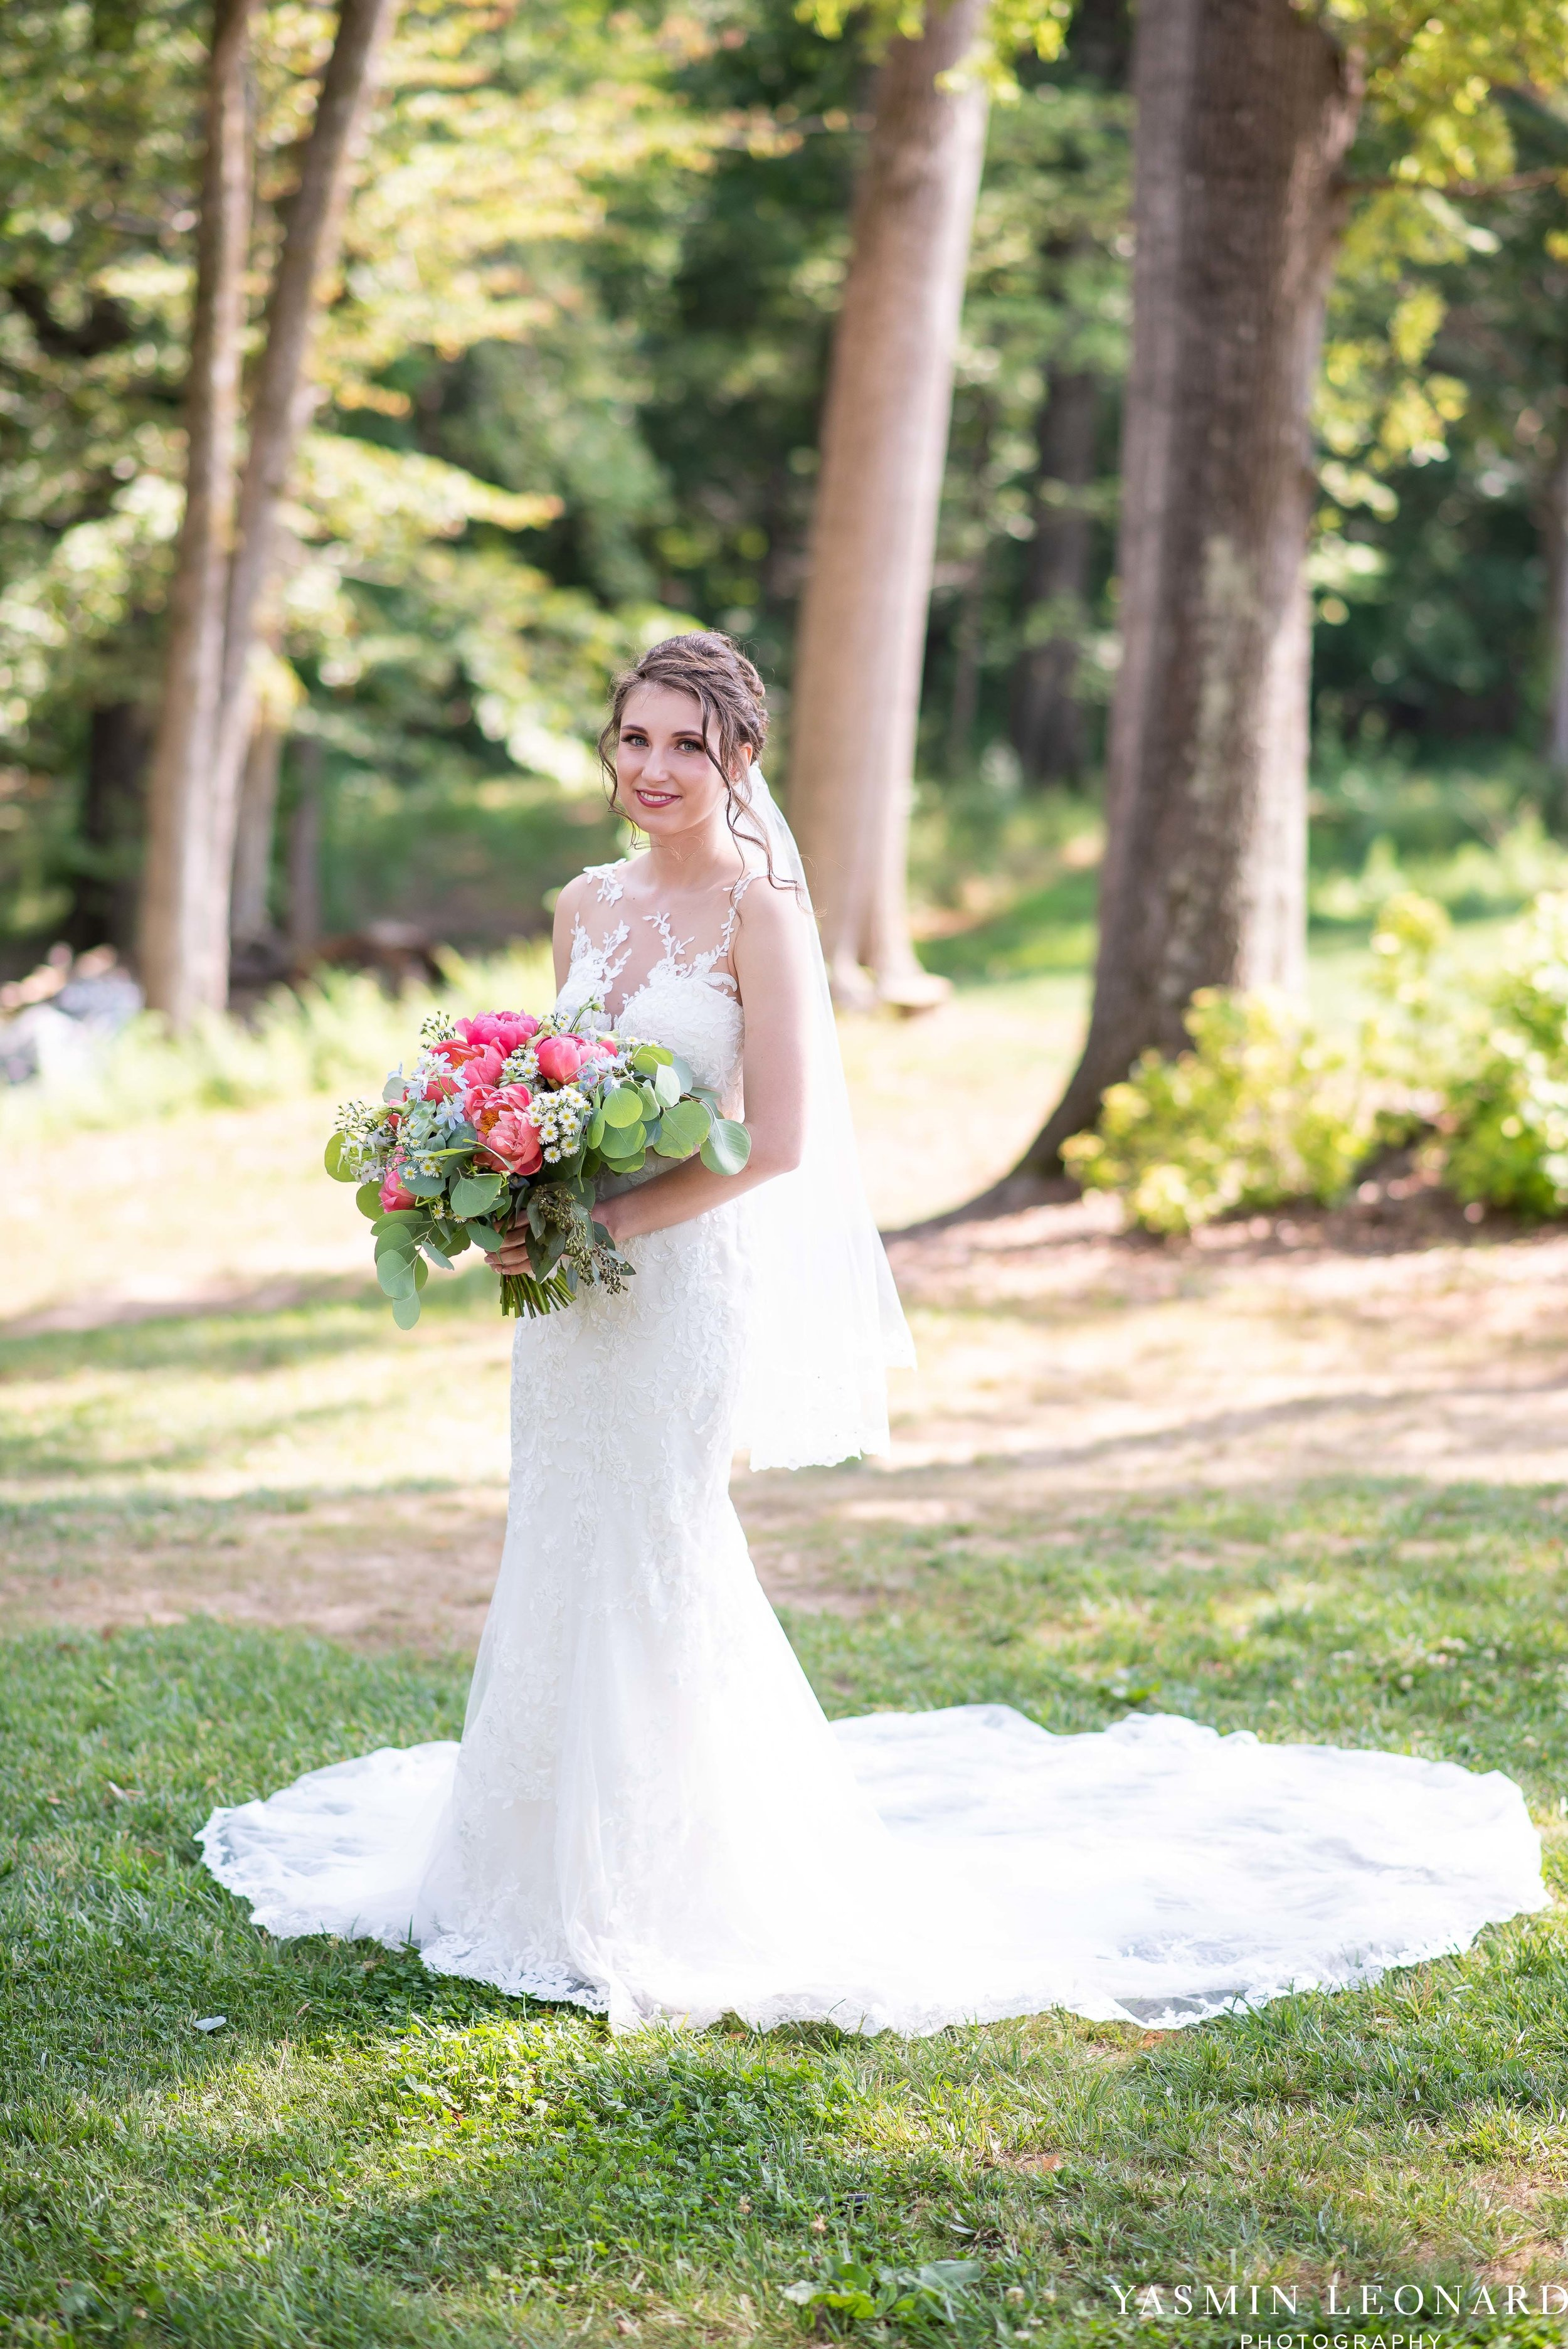 Old Homeplace Vineyard - NC Weddings - Outdoor Summer Weddings - Peony Boutique - Vineyard Wedding - NC Photographer - Yasmin Leonard Photography-16.jpg